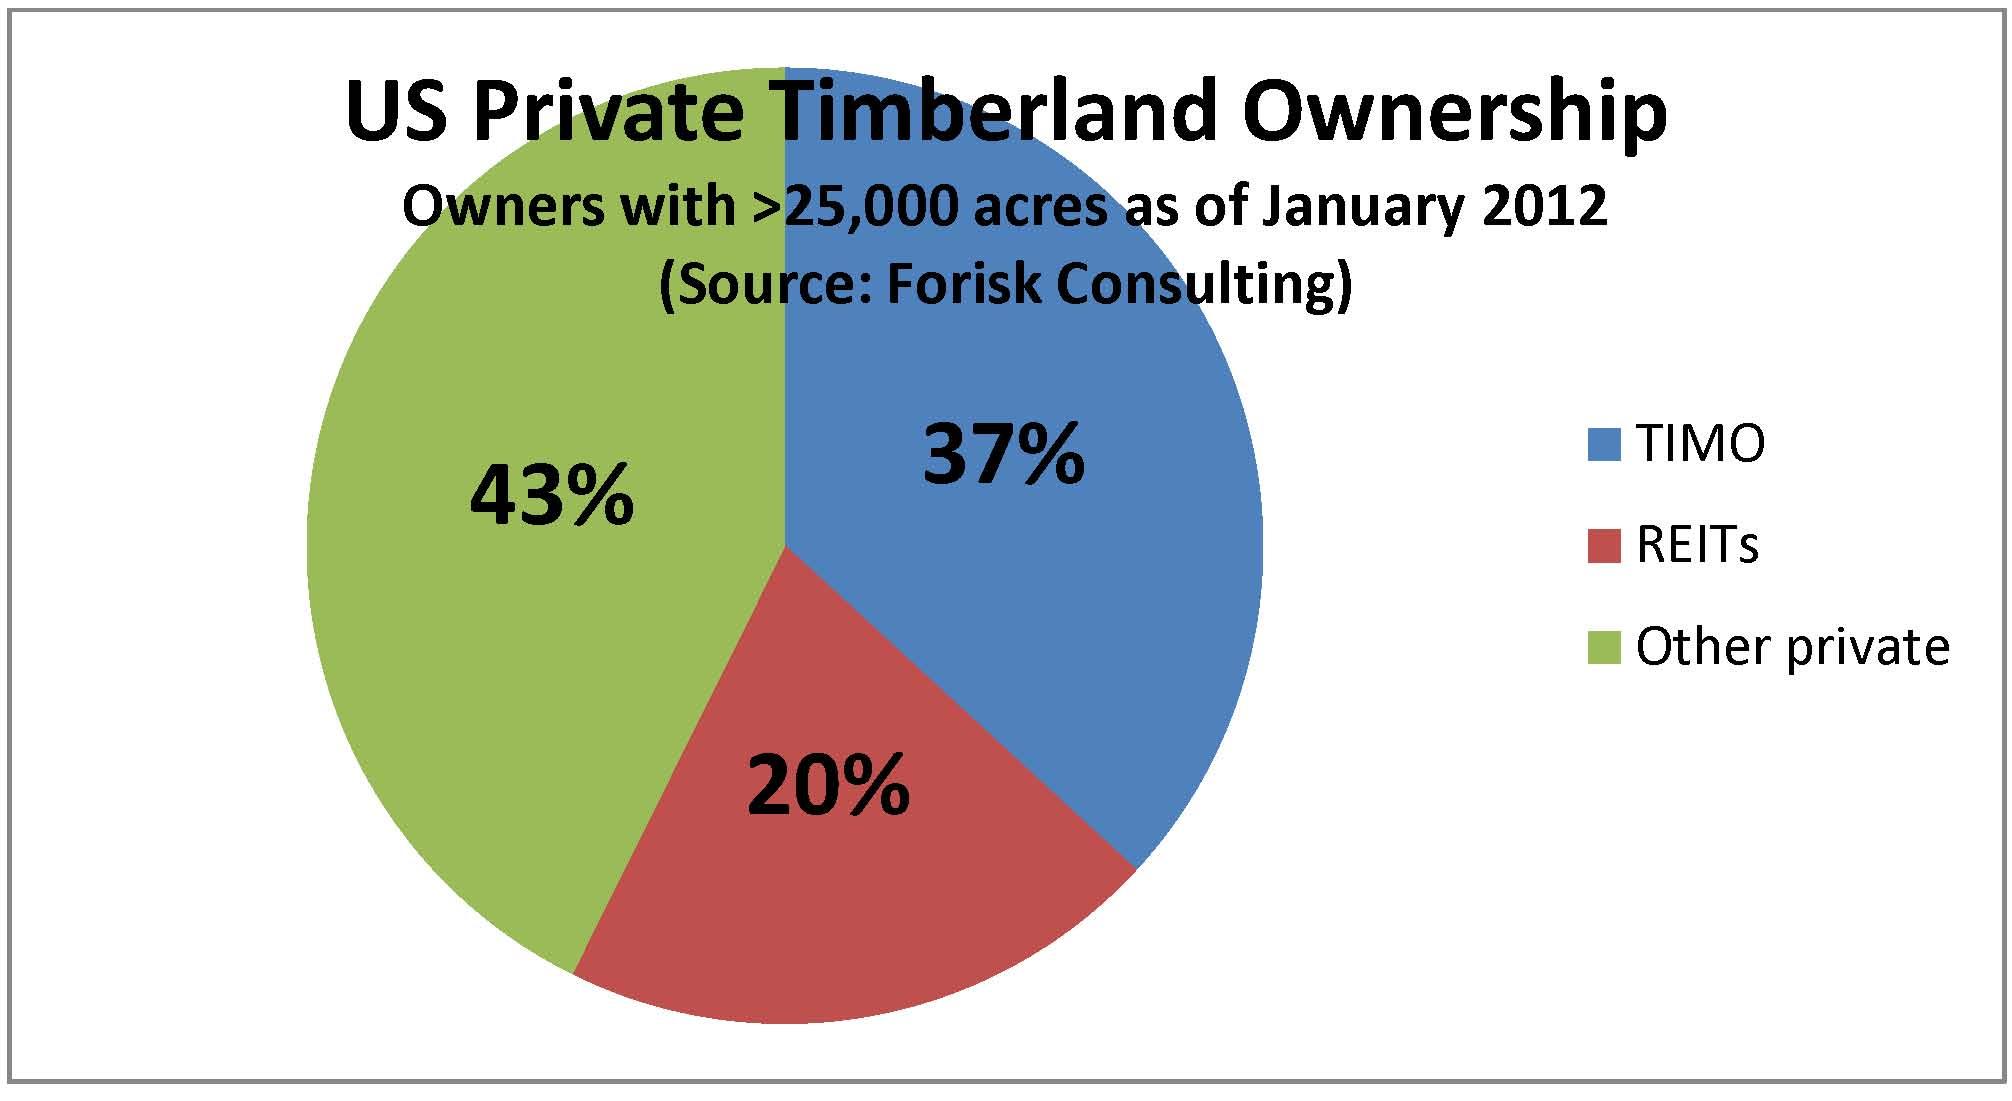 Economic Analysis of Timberland